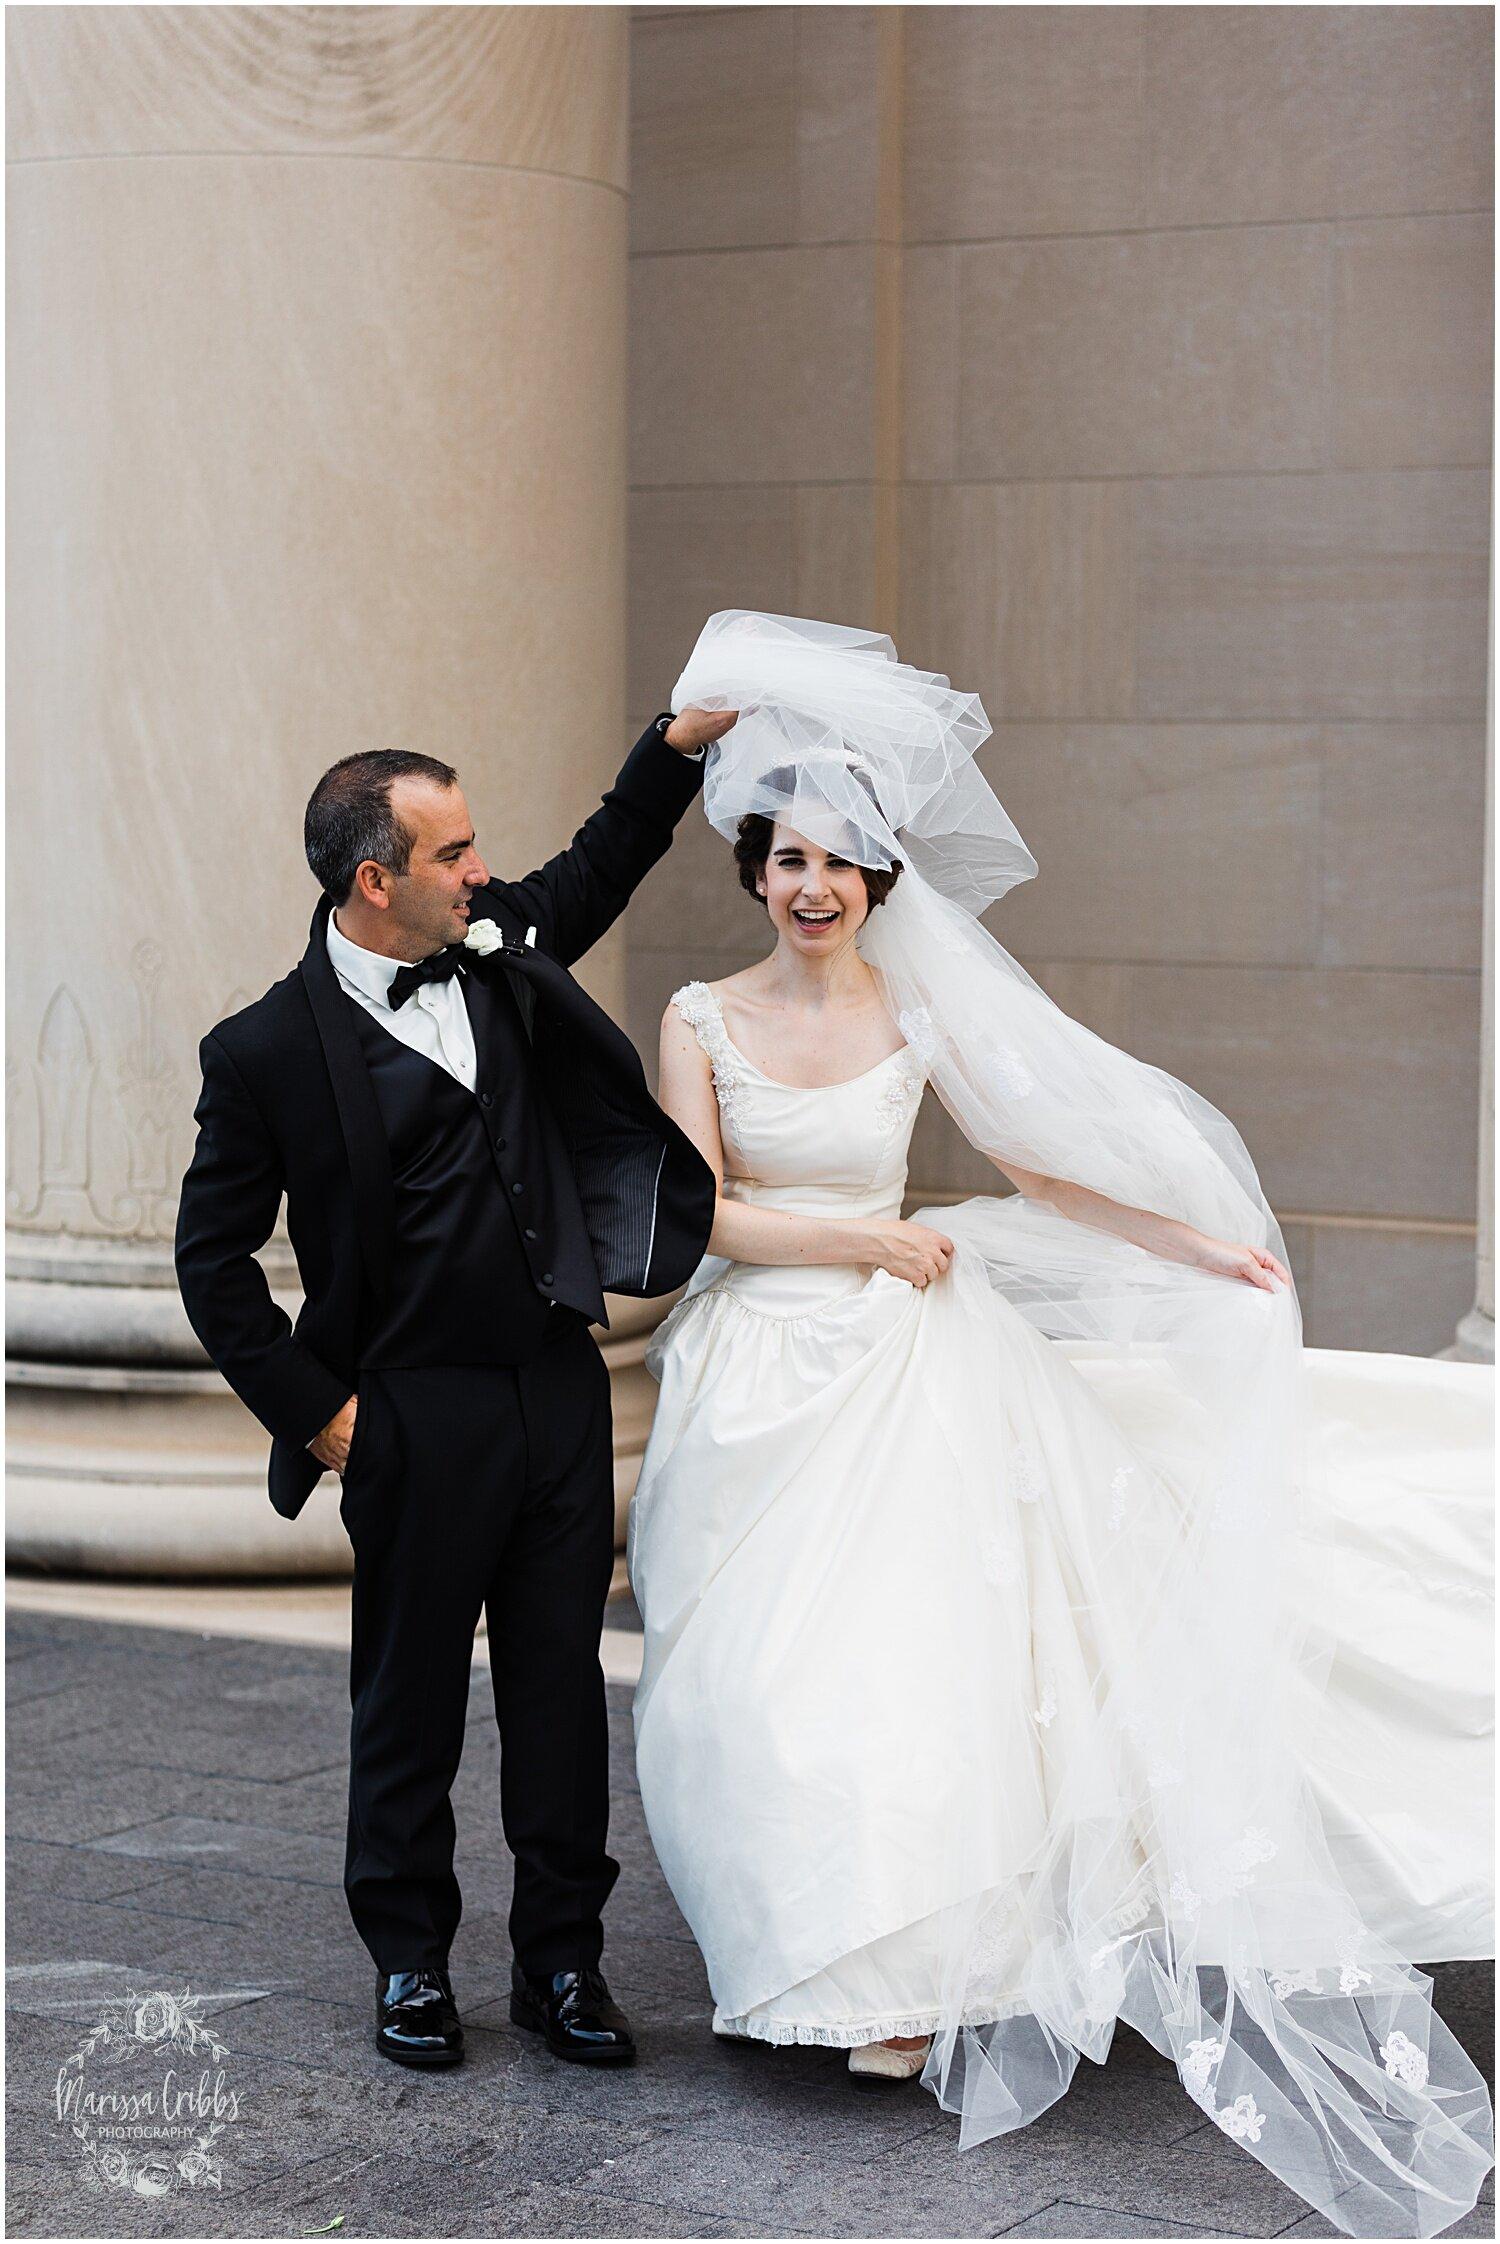 TYLER & CAROLINE MARRIED BLOG | MARISSA CRIBBS PHOTOGRAPHY | THE CARRIAGE CLUB | KANSAS CITY WEDDING PHOTOS_9258.jpg